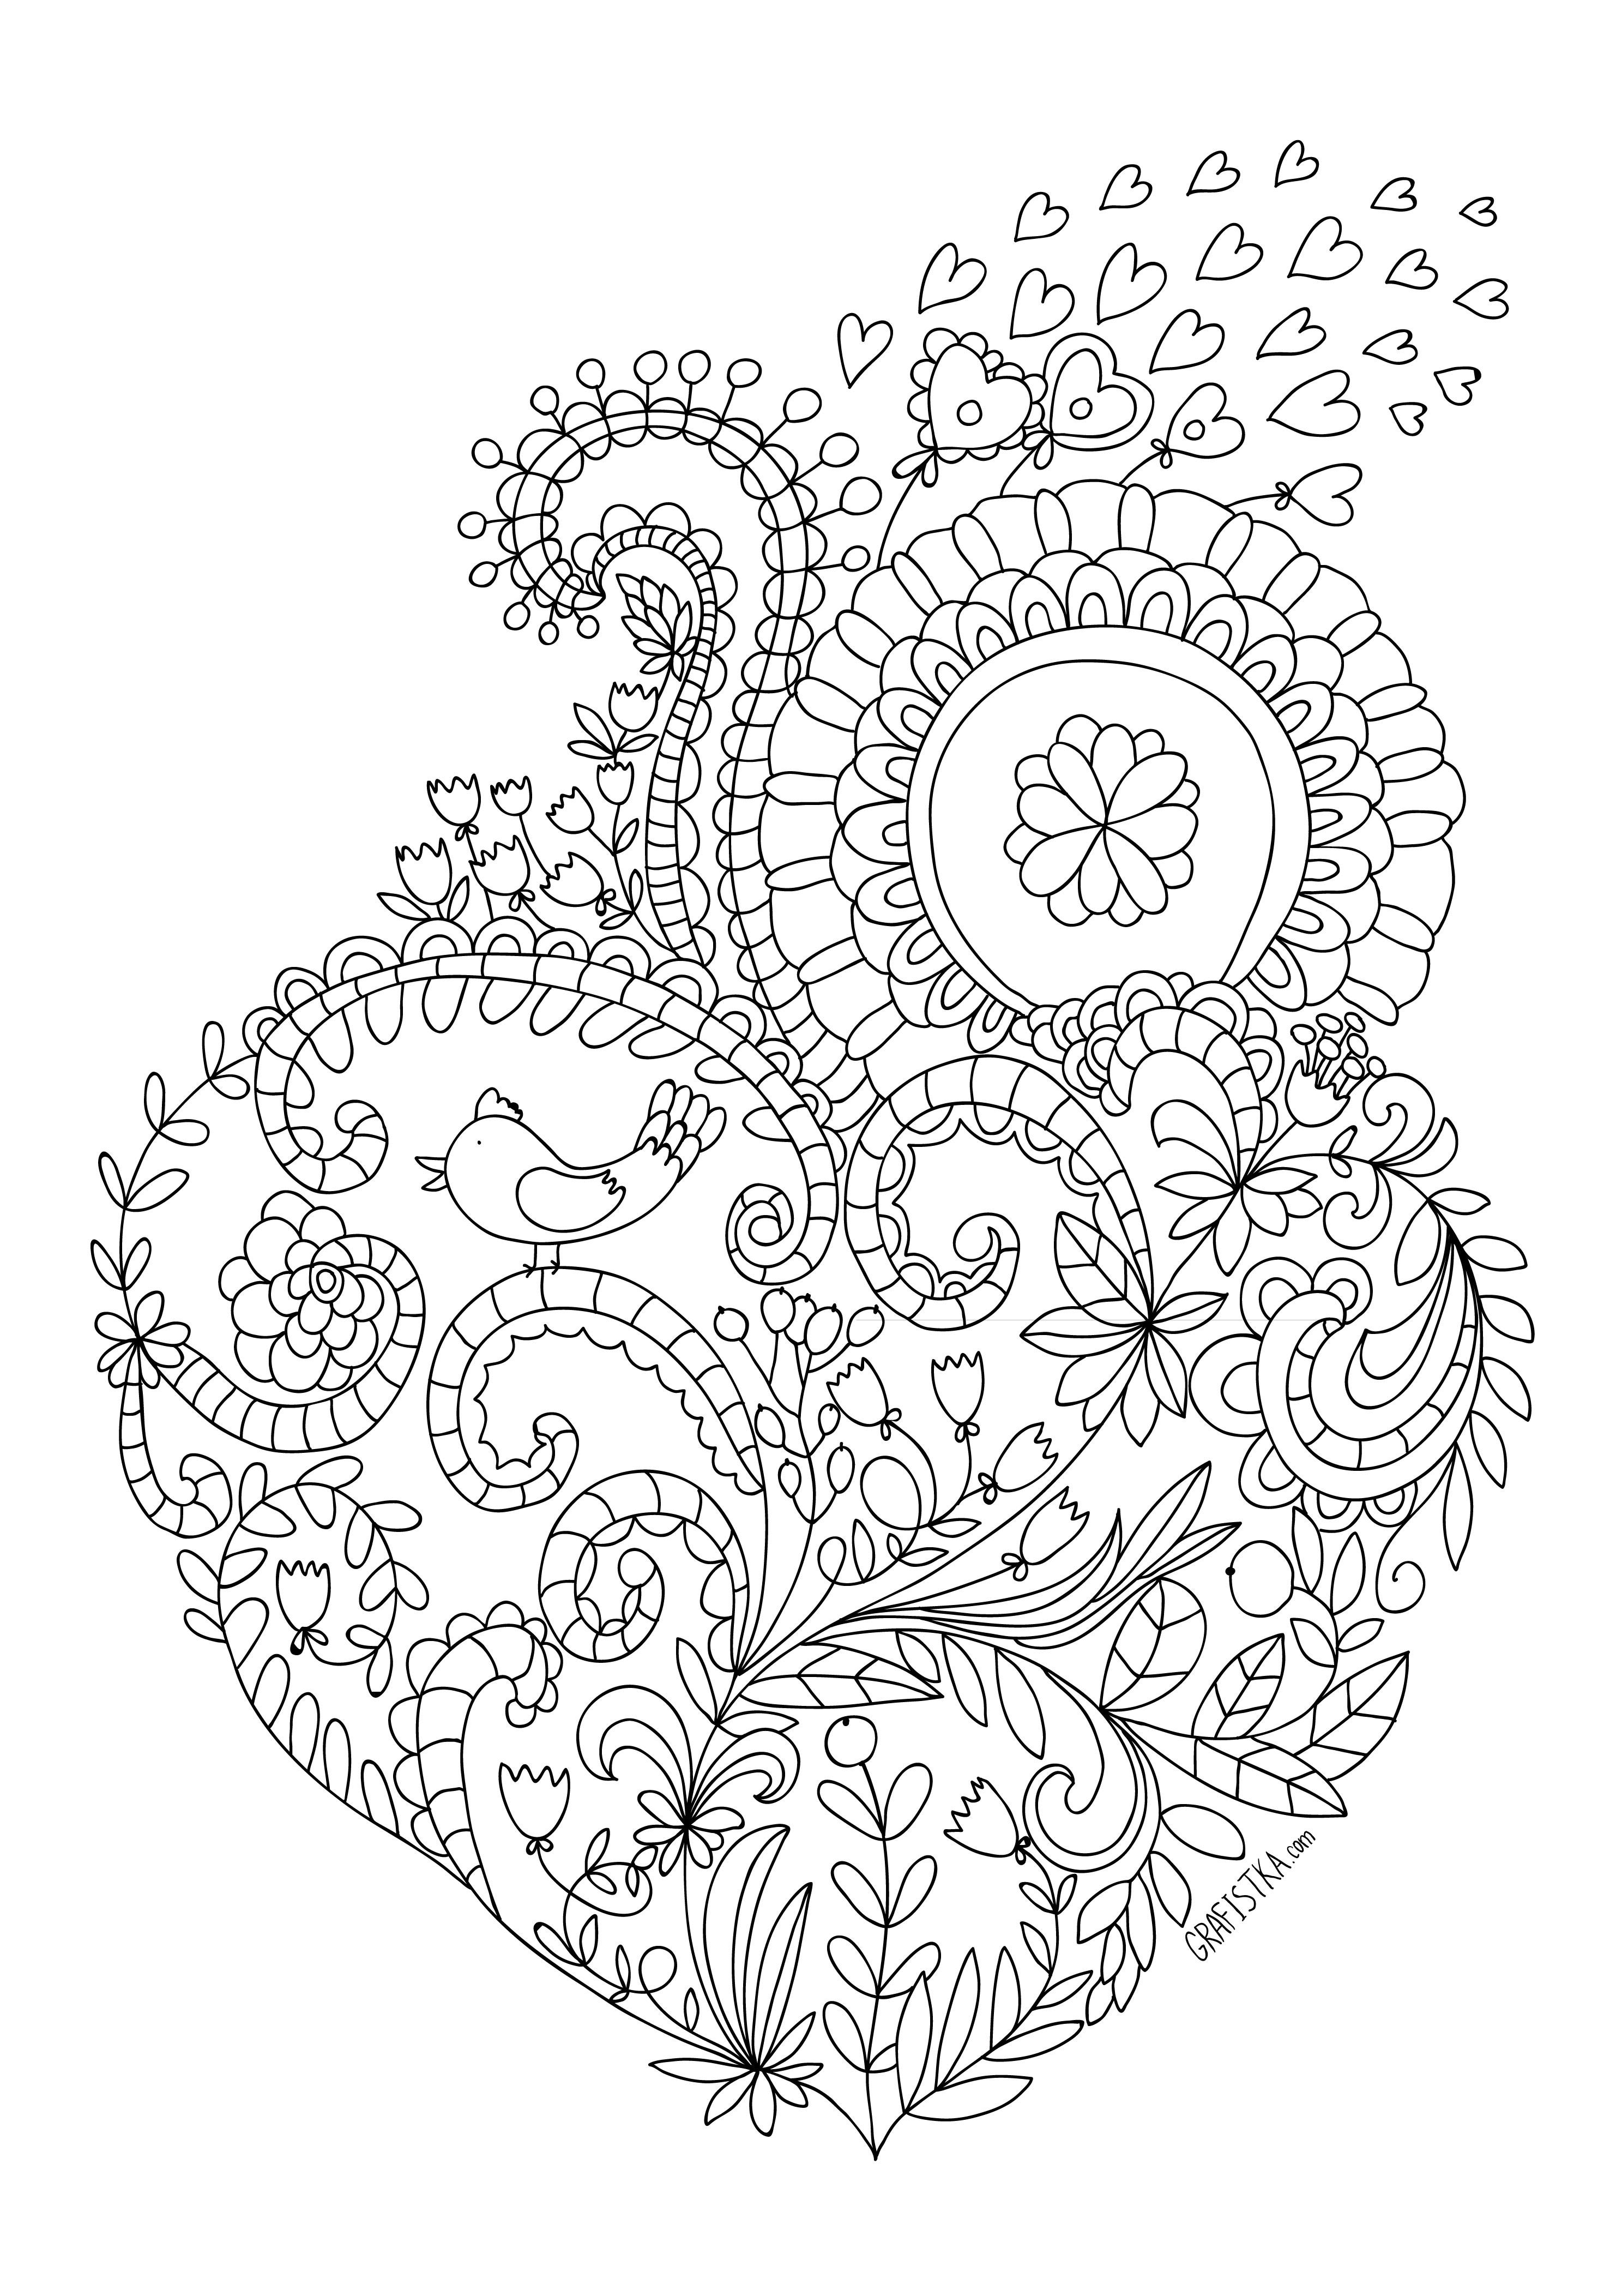 Птица Раскраски антистресс  сердце из цветов Для детей онлайн раскраски с цветамираскраски цветы